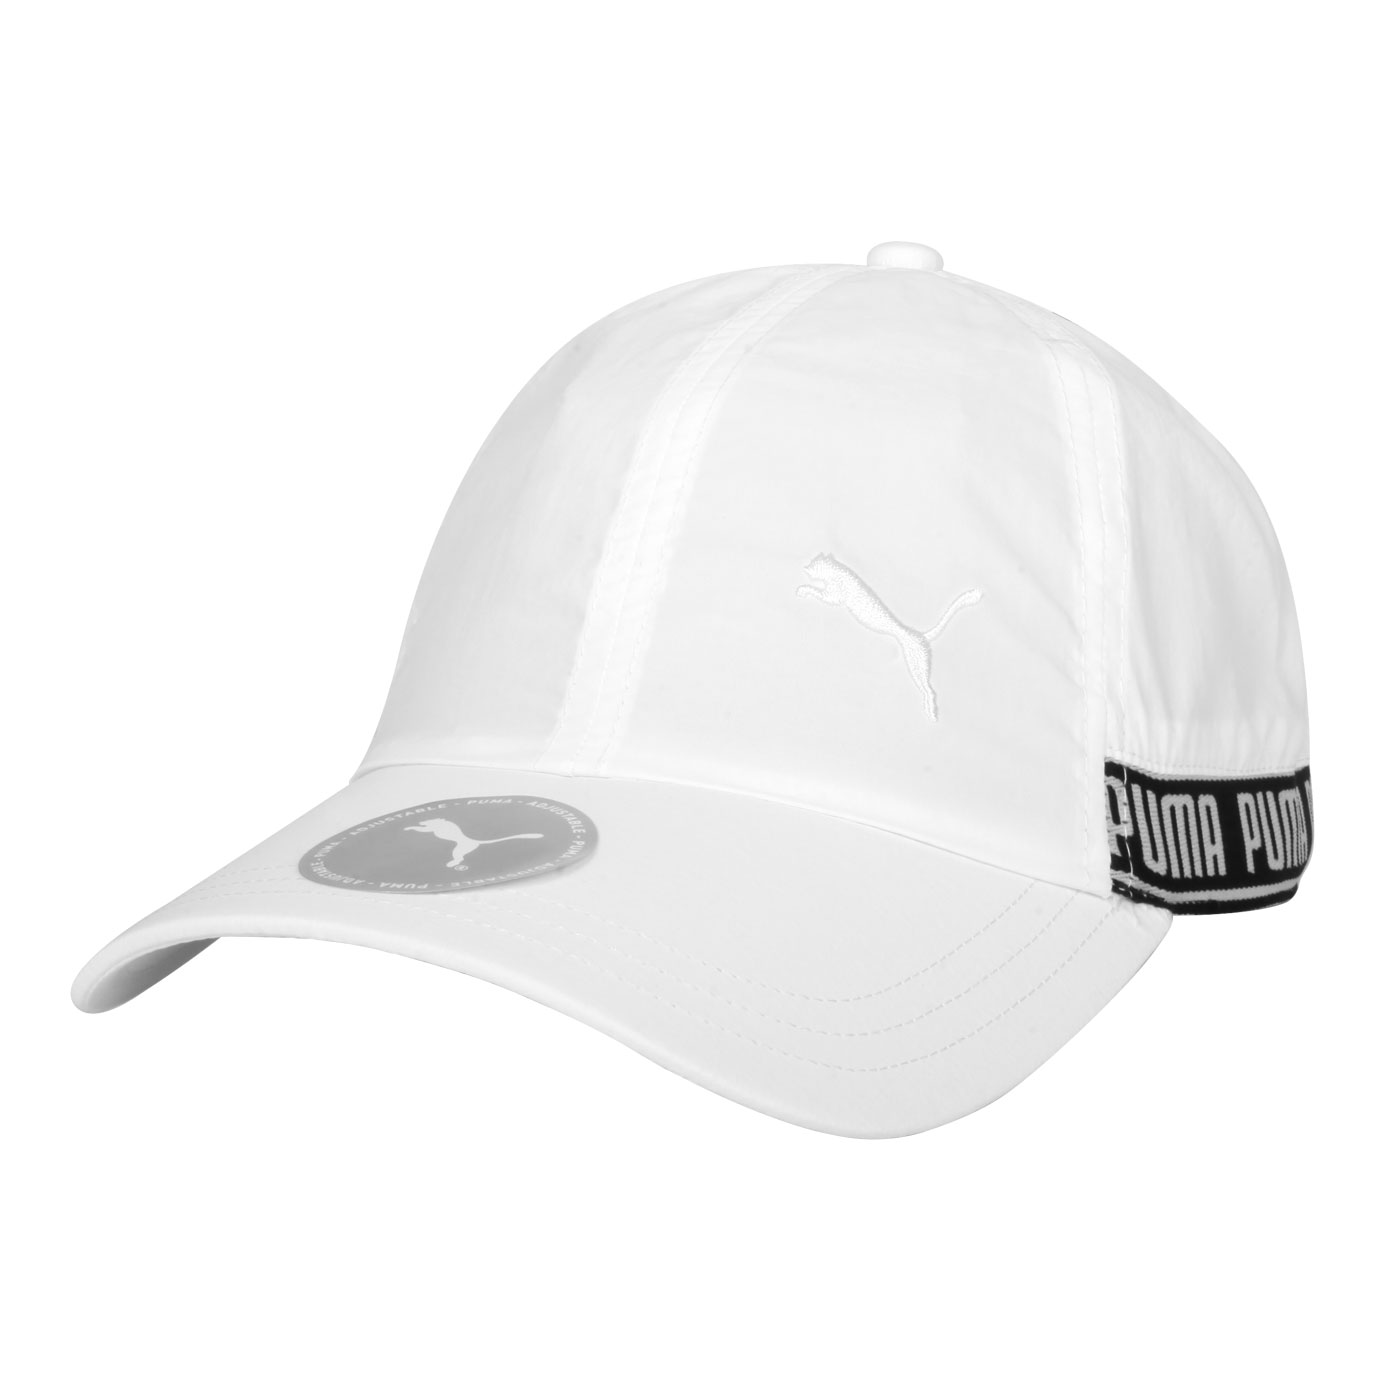 PUMA 棒球帽 02285402